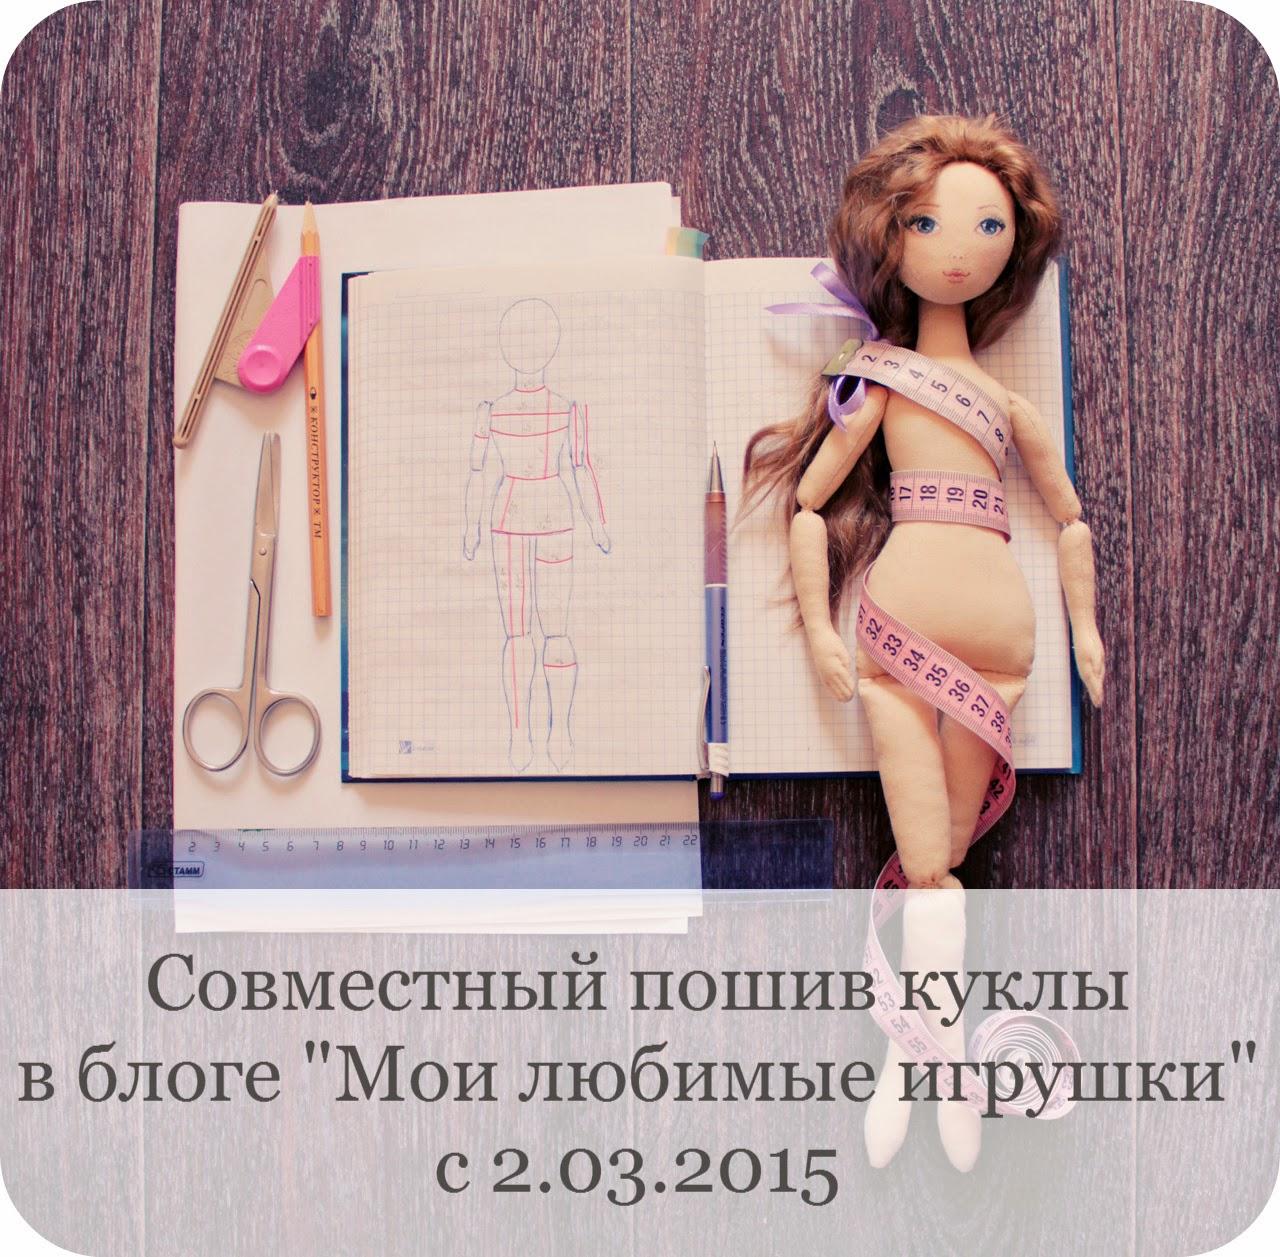 СП Куклы